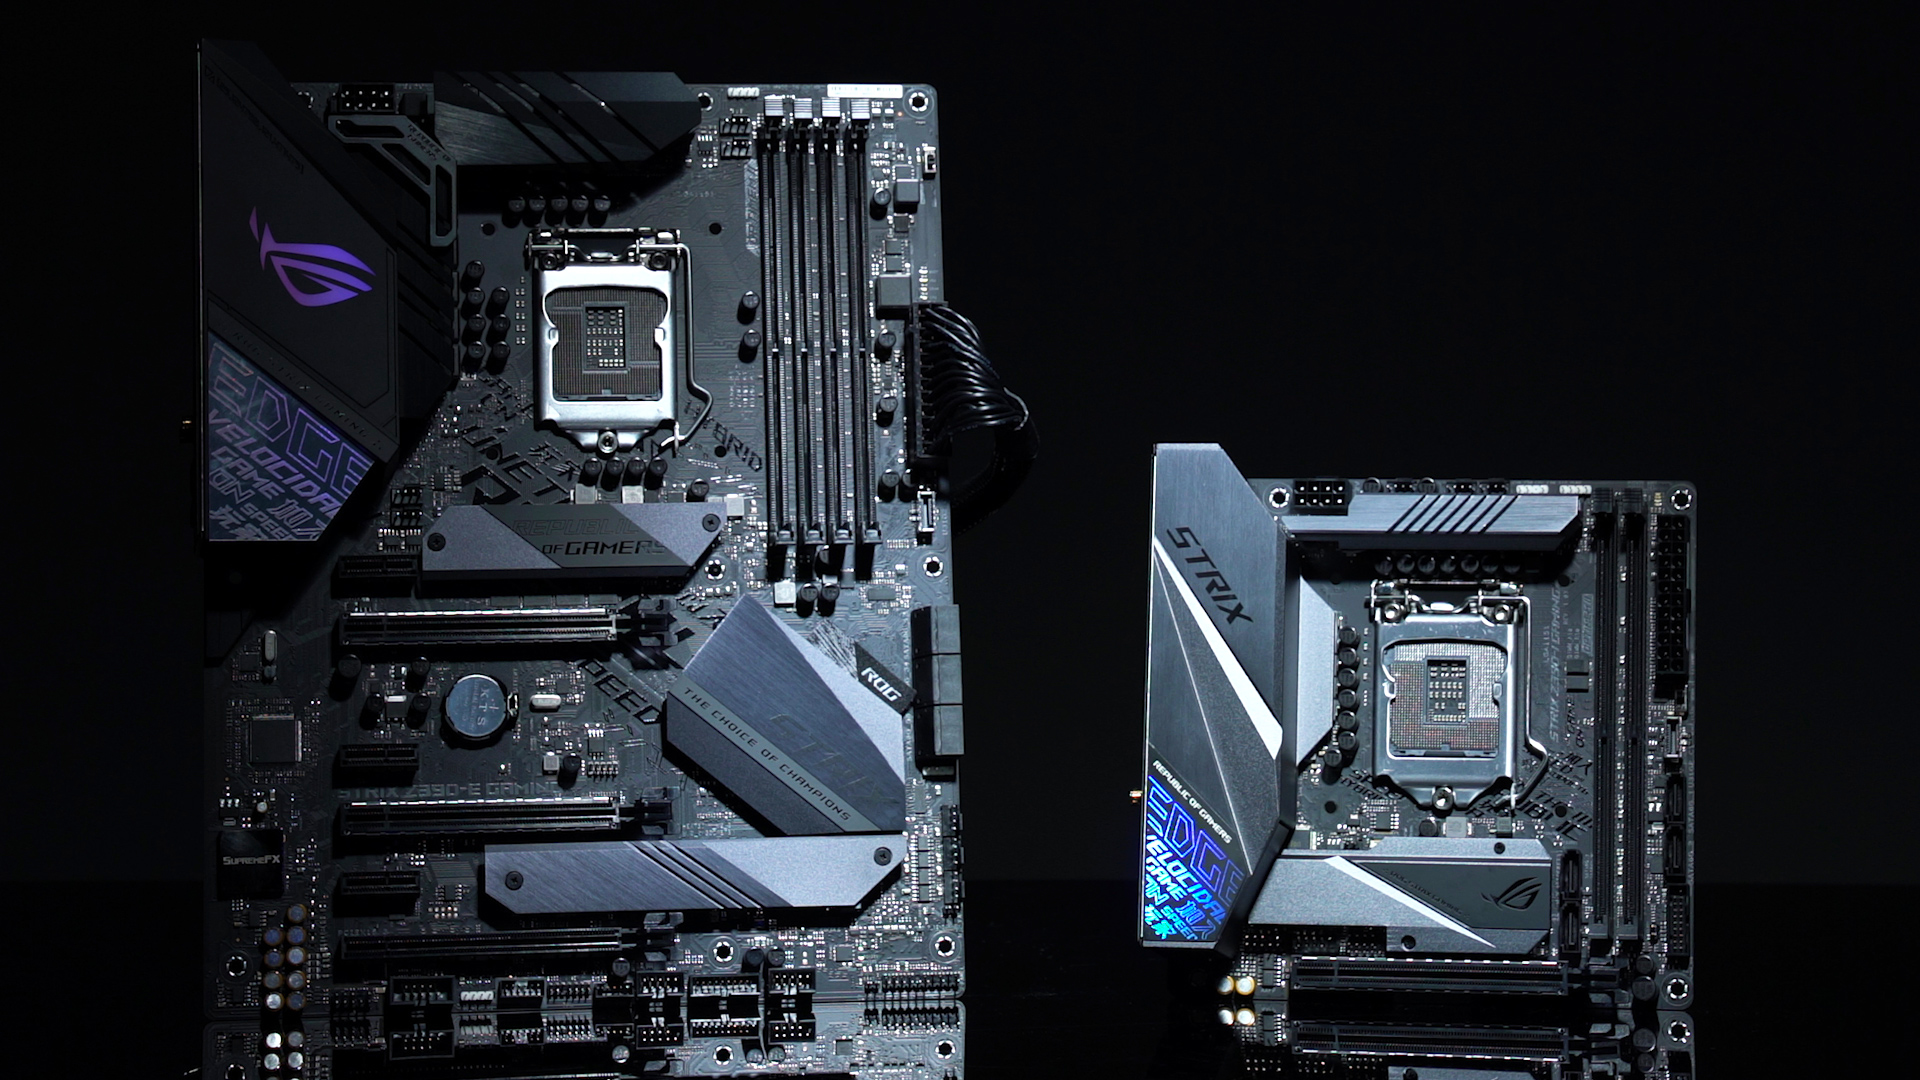 Asus Rog Strix Z390 E Gaming Strix Z390 I Gaming Motherboards Detailed Analysis Newegg Insider